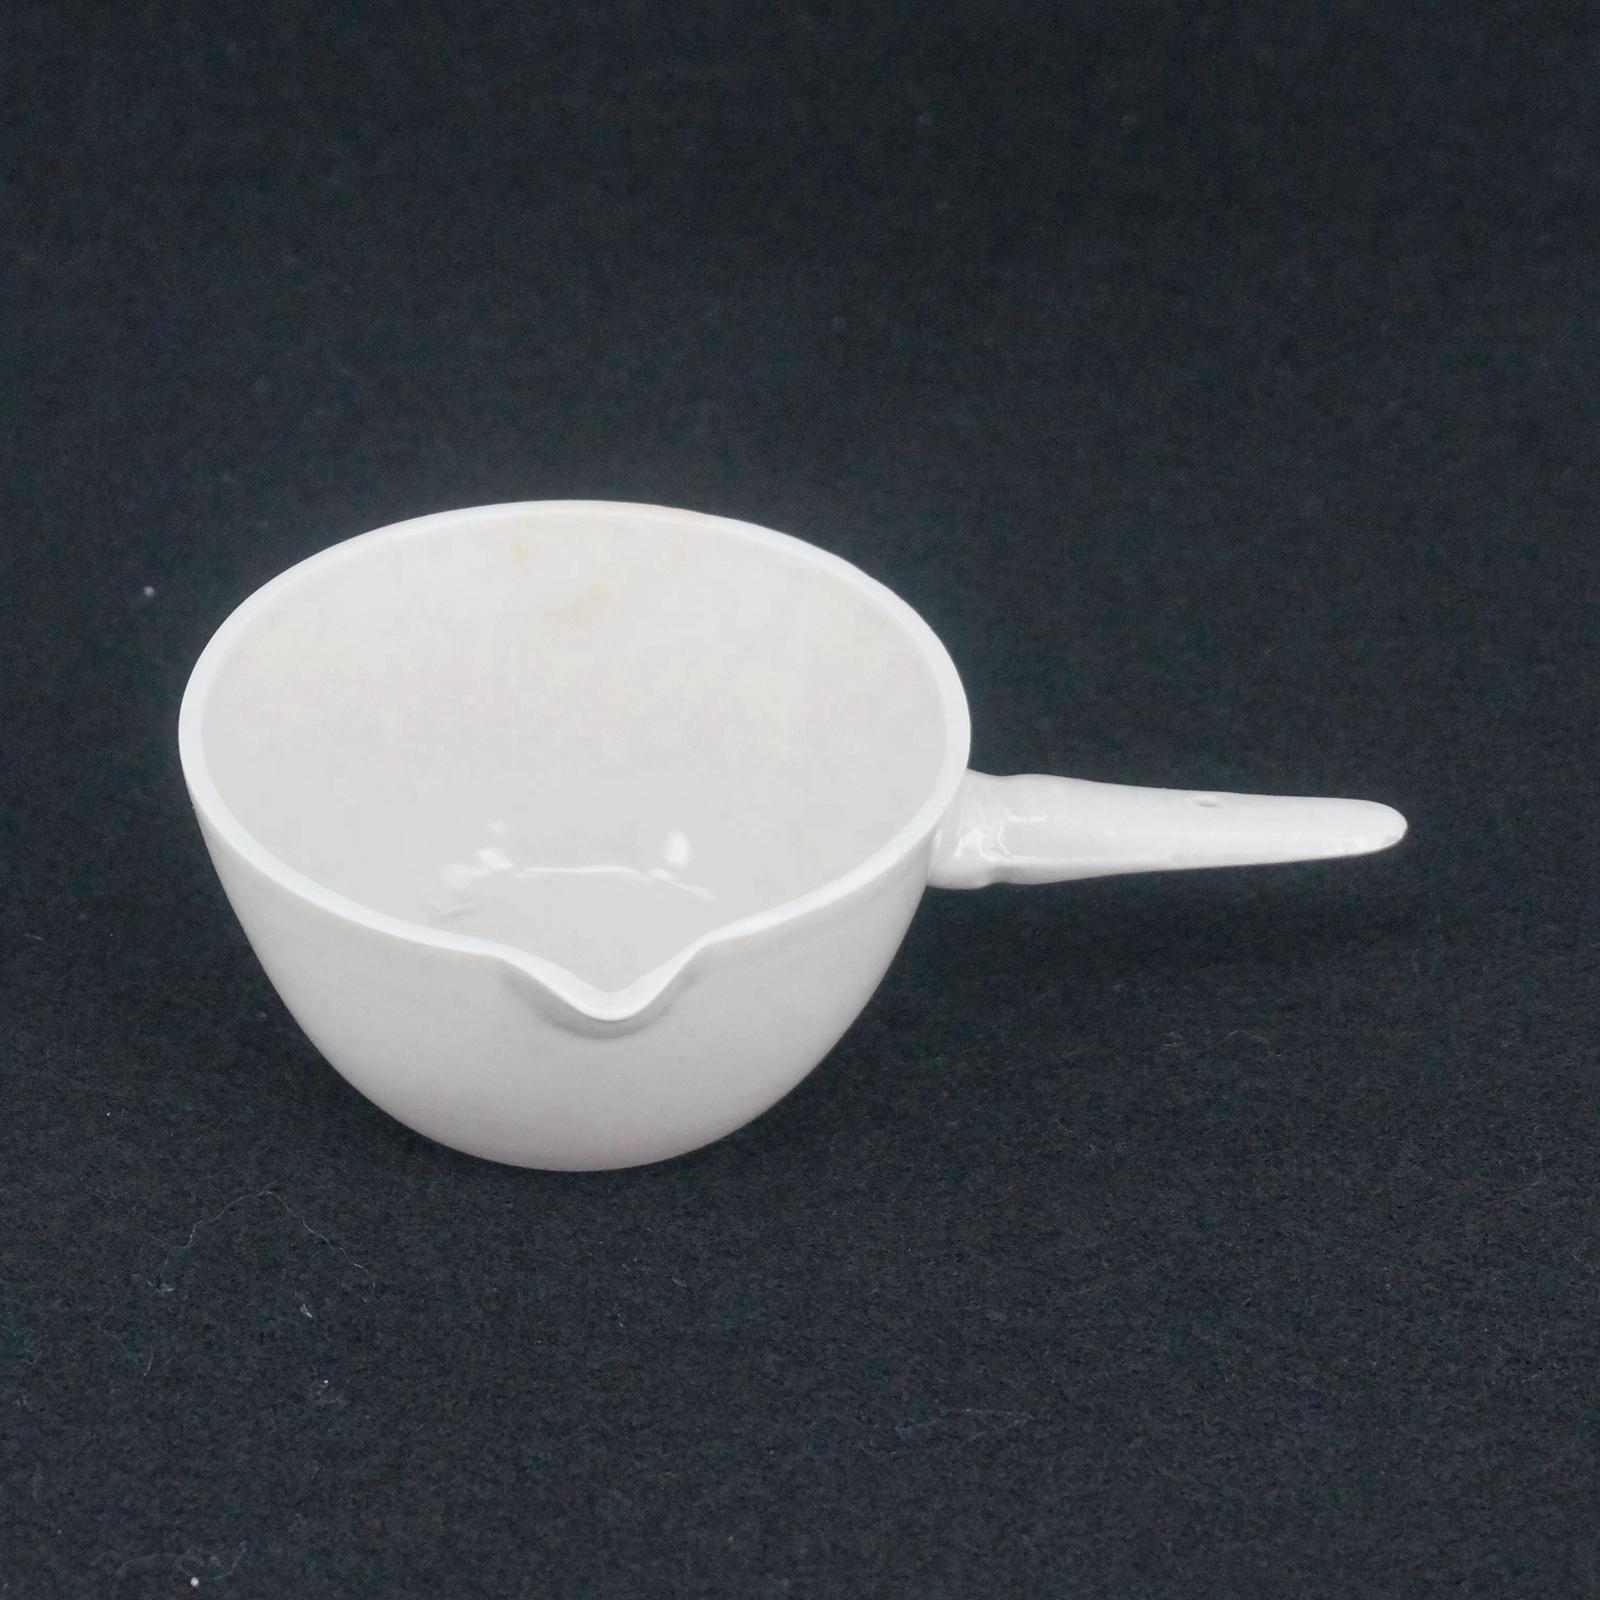 Wholesale- 100ml Ceramic Evaporating Dish Round Bottom with Handle ... for Laboratory Evaporating Dish  29dqh